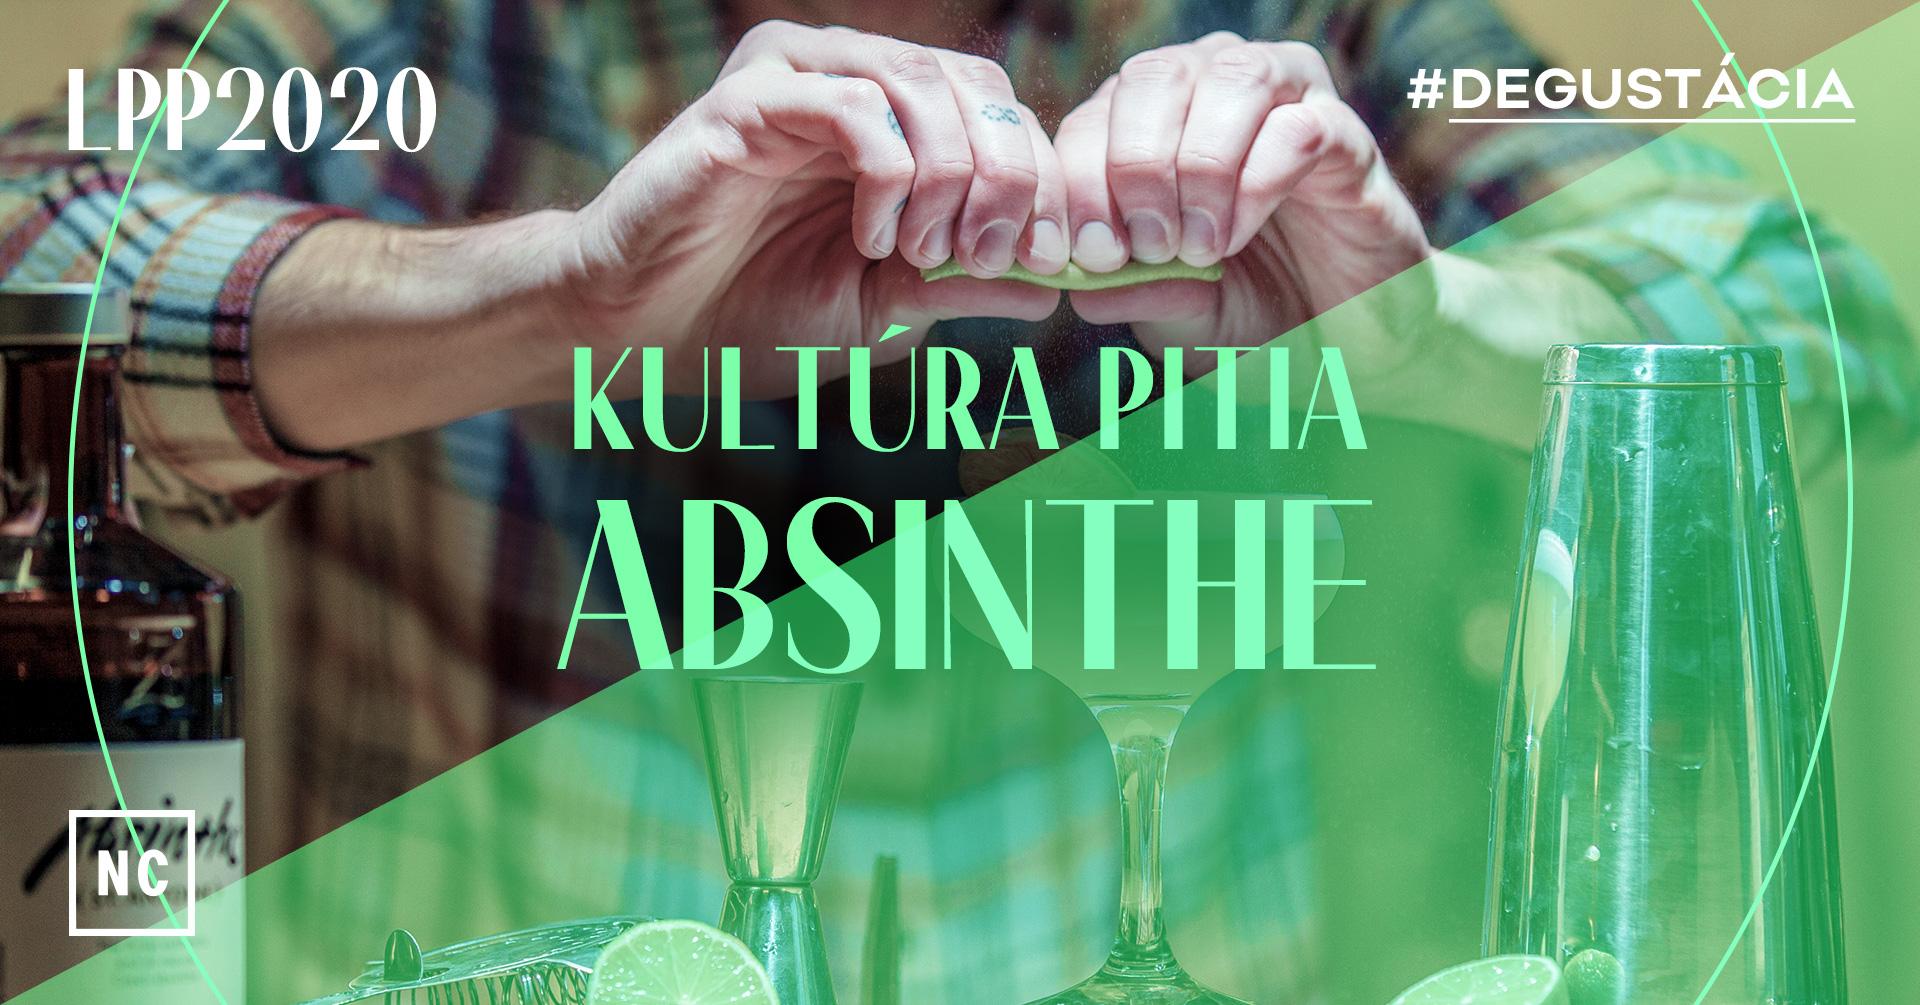 LPP_FBevent_08_kultura-pitia-Absint-NEW